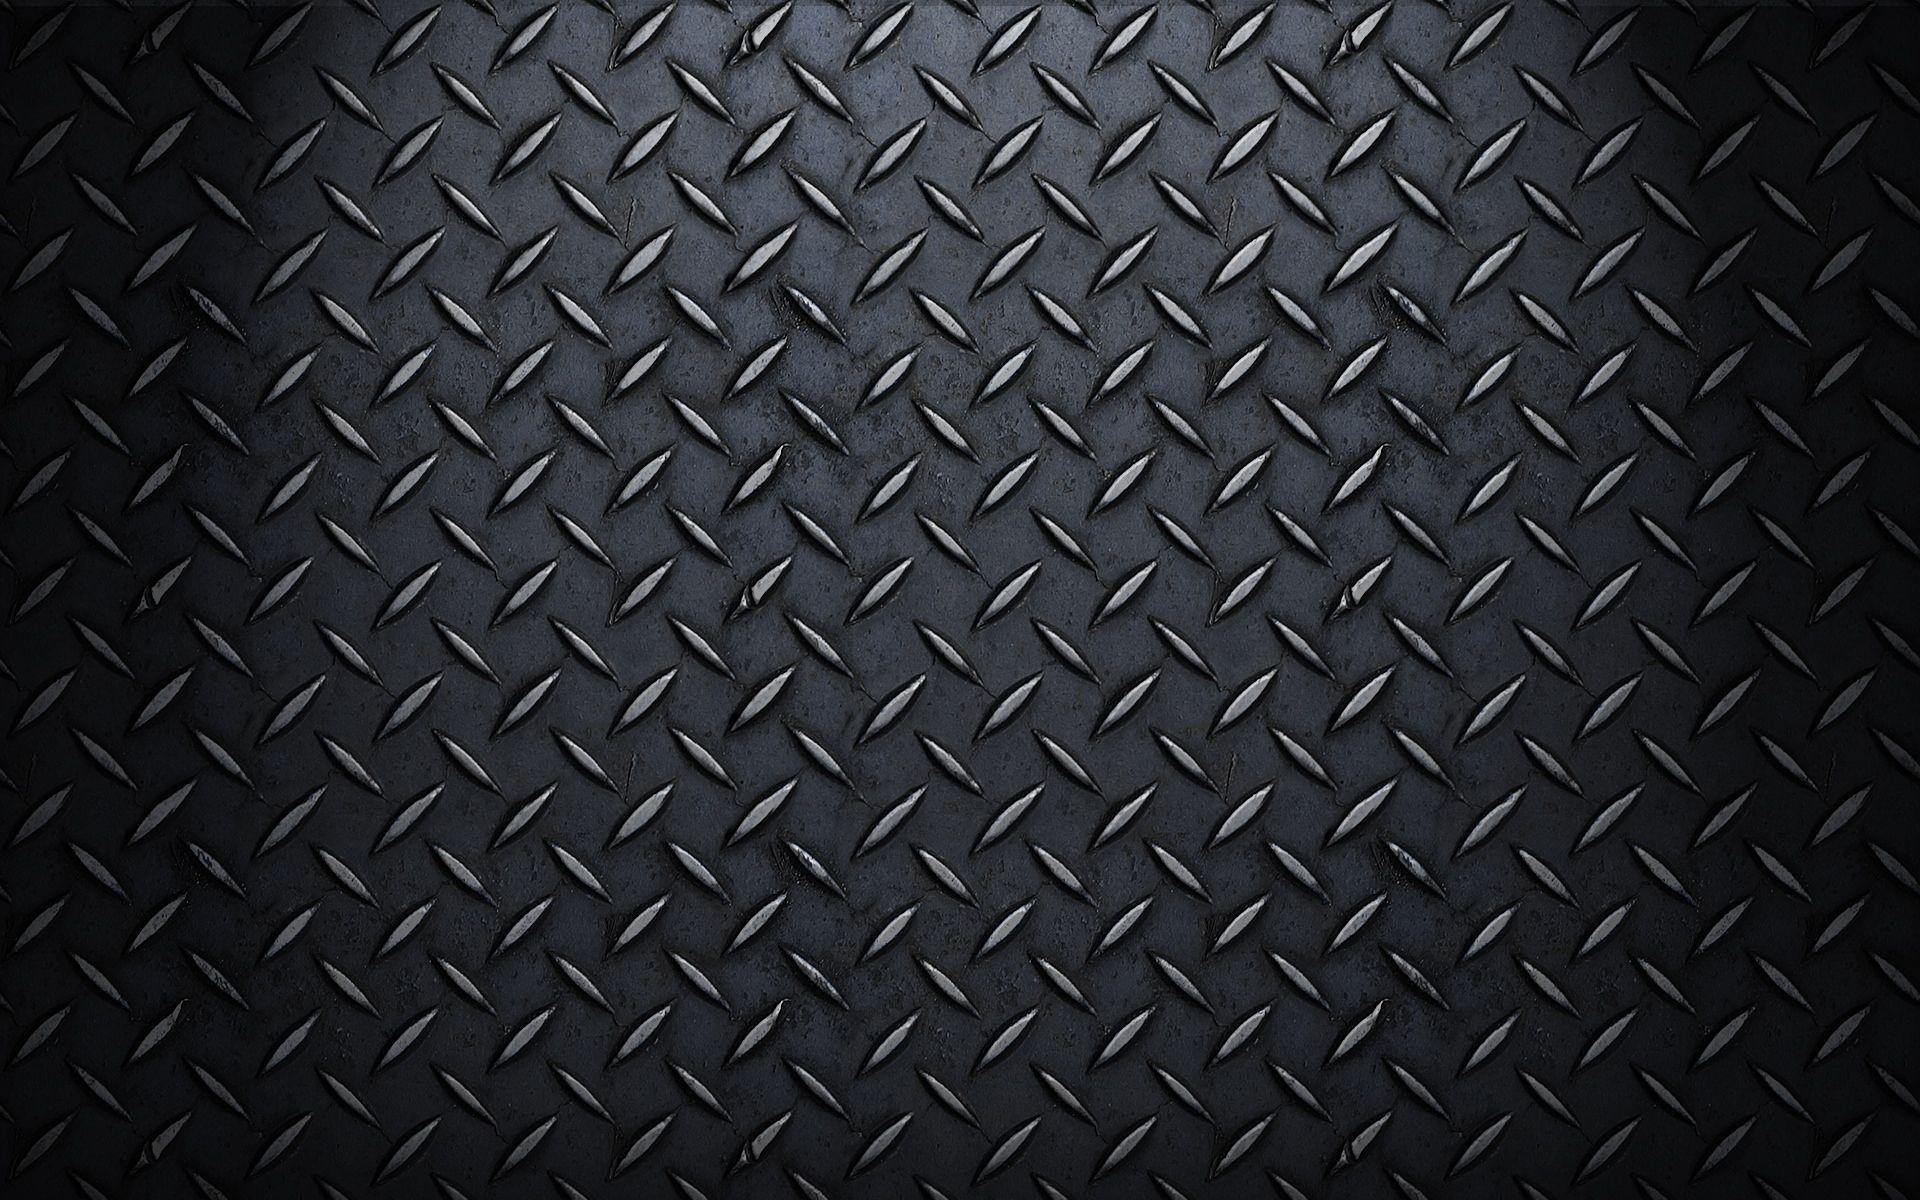 Res: 1920x1200, Awesome Windows Metal Grid Pics - Windows Metal Grid Wallpapers